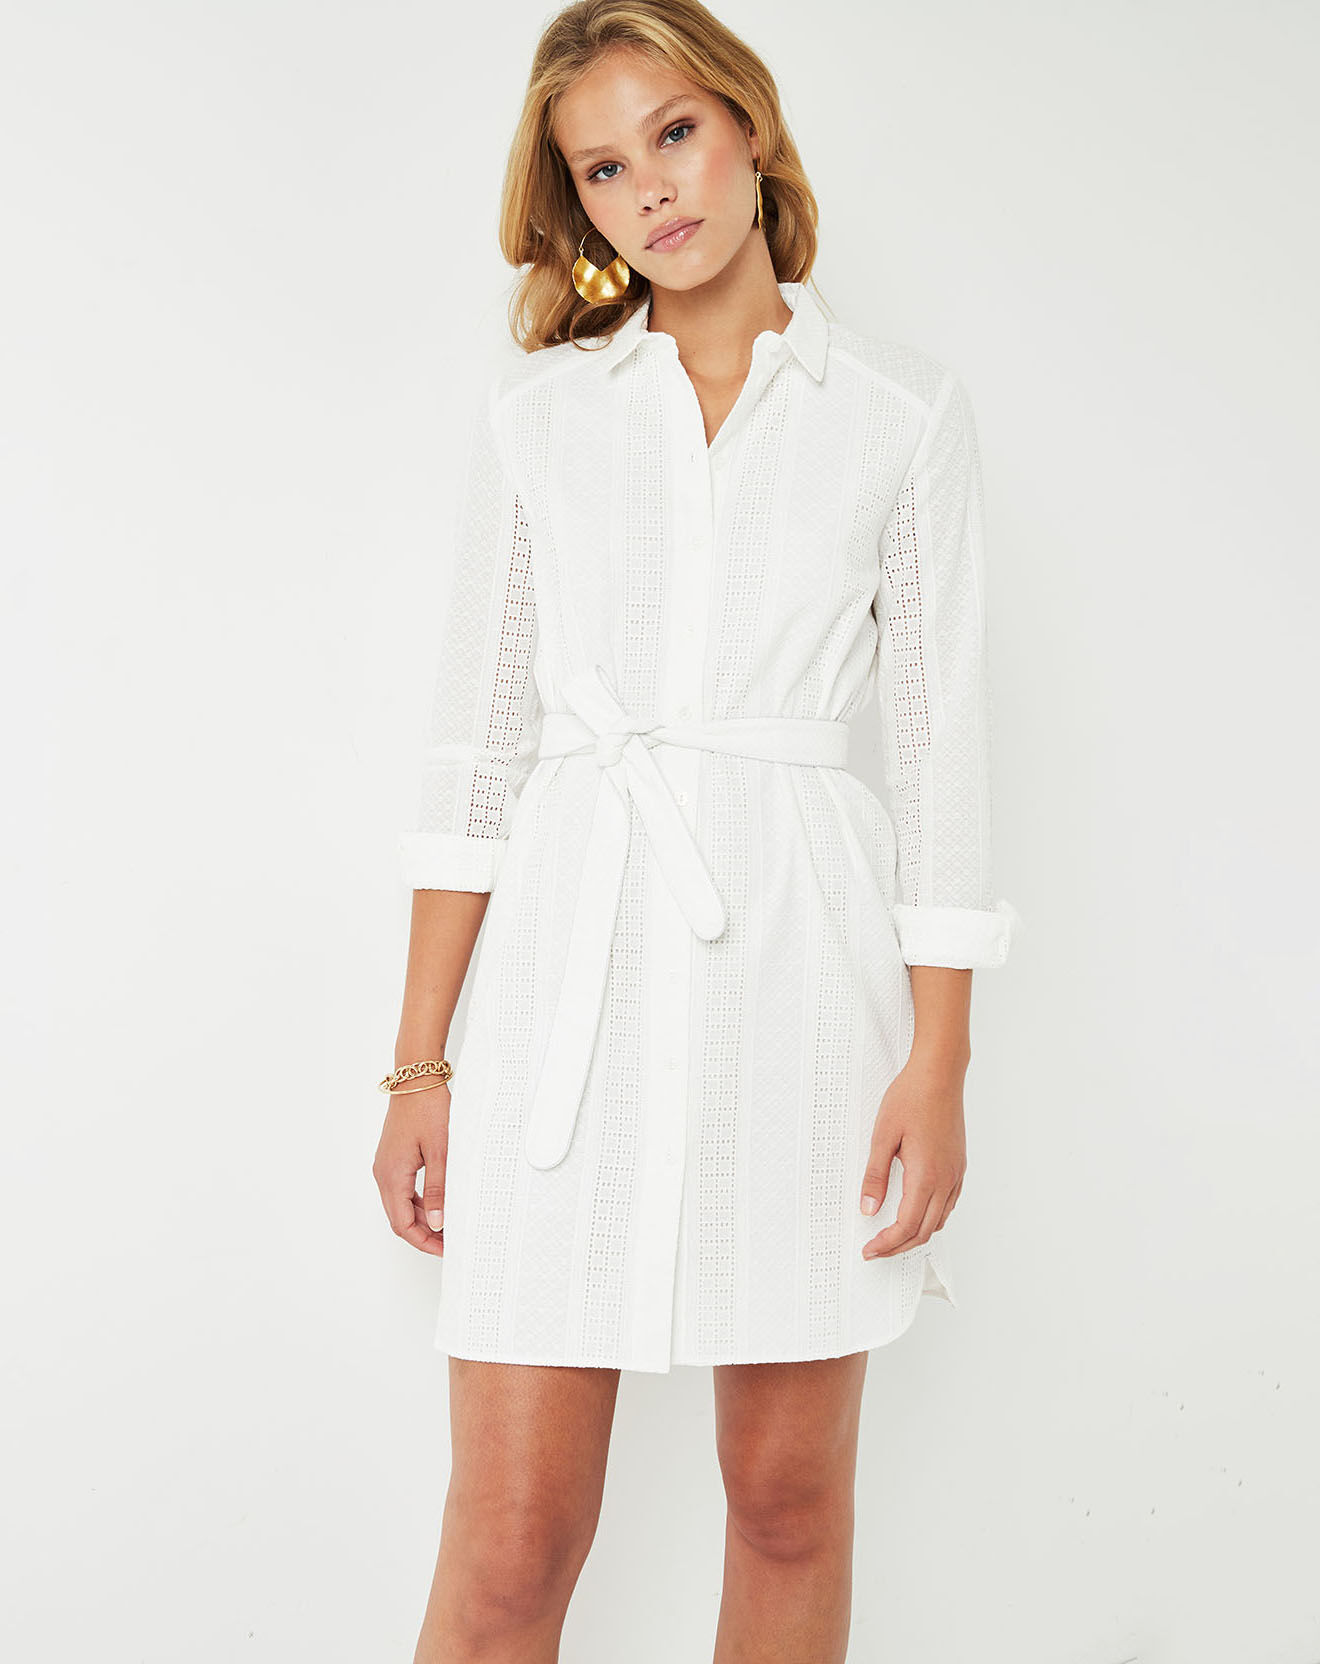 Robe brodée Eclose blanche - Cuisse de Grenouille - Modalova